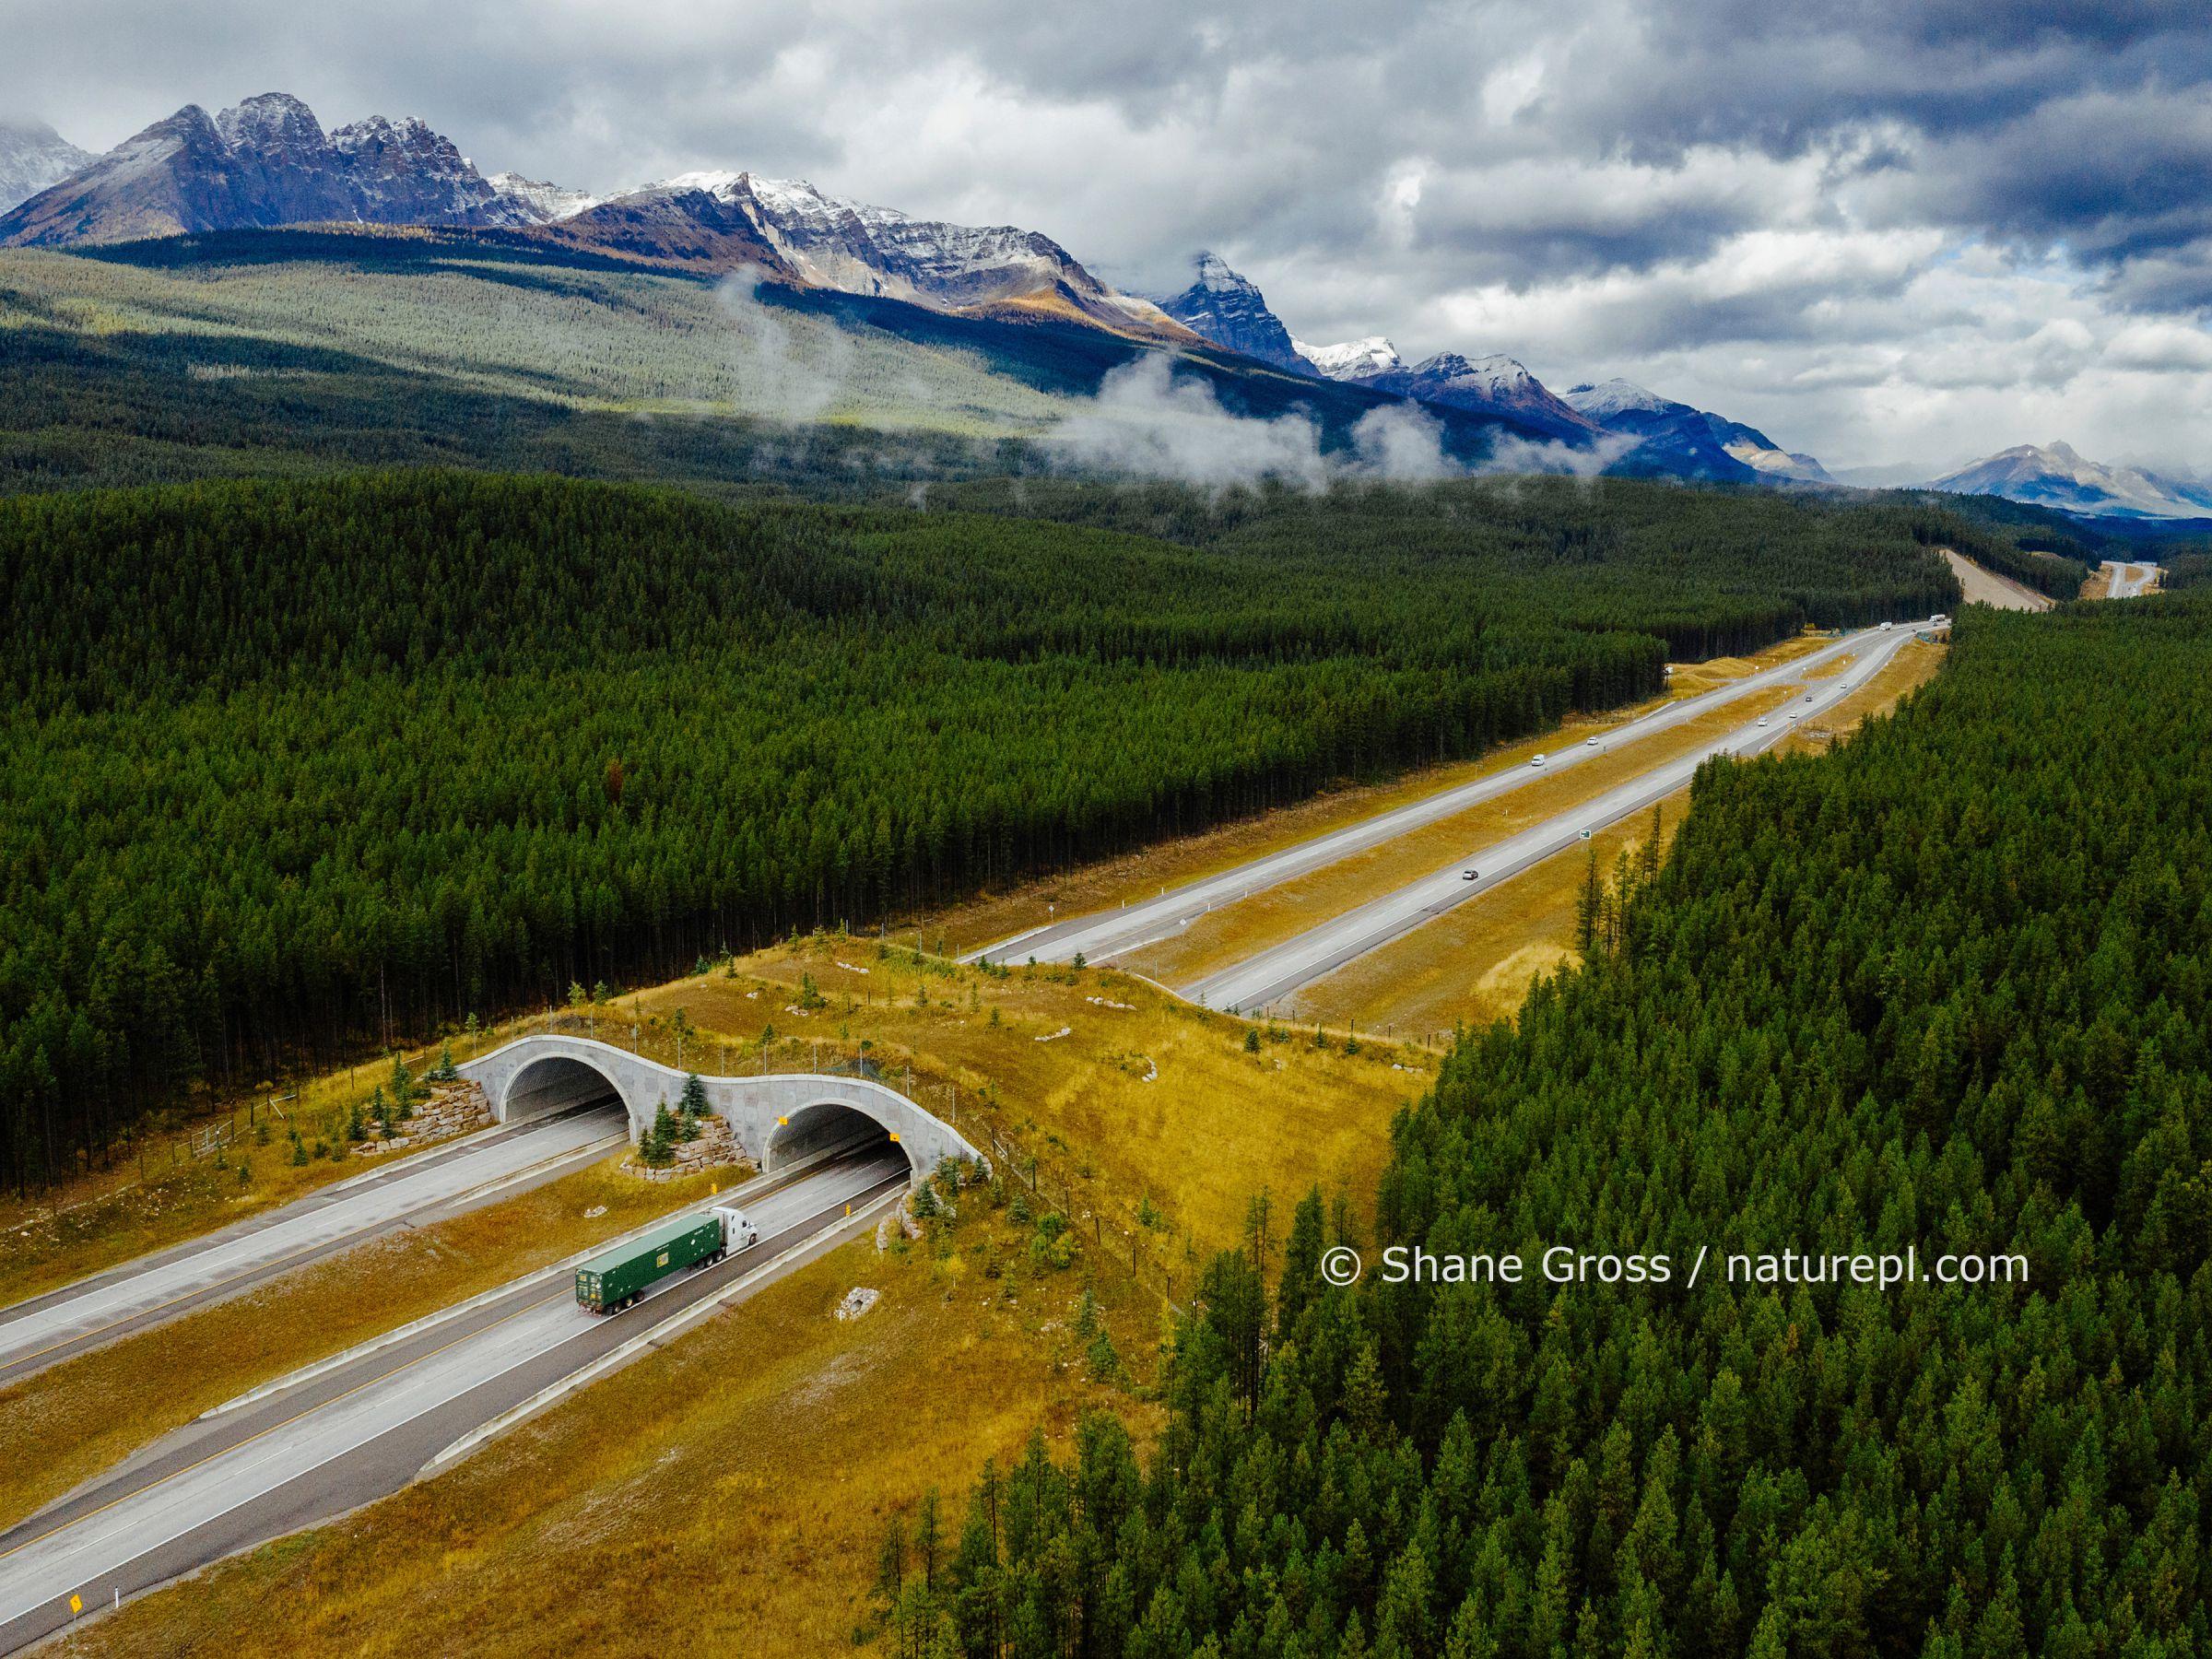 Animal crossing bridge over highway road in Banff, Alberta, Canada.